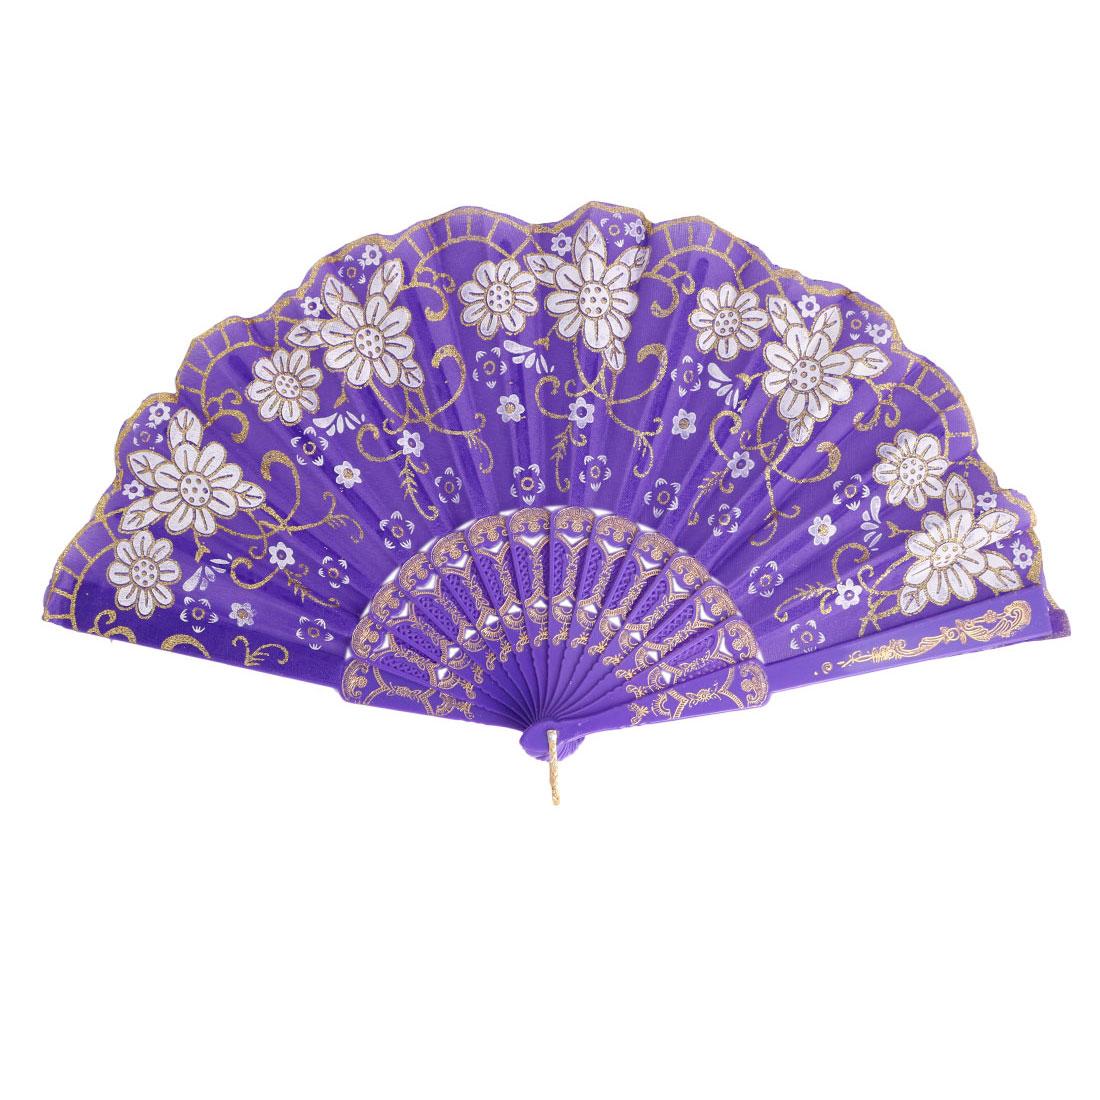 Lady Plastic Frame Floral Pattern Elegant Dance Hand-crafted Folding Hand Fan